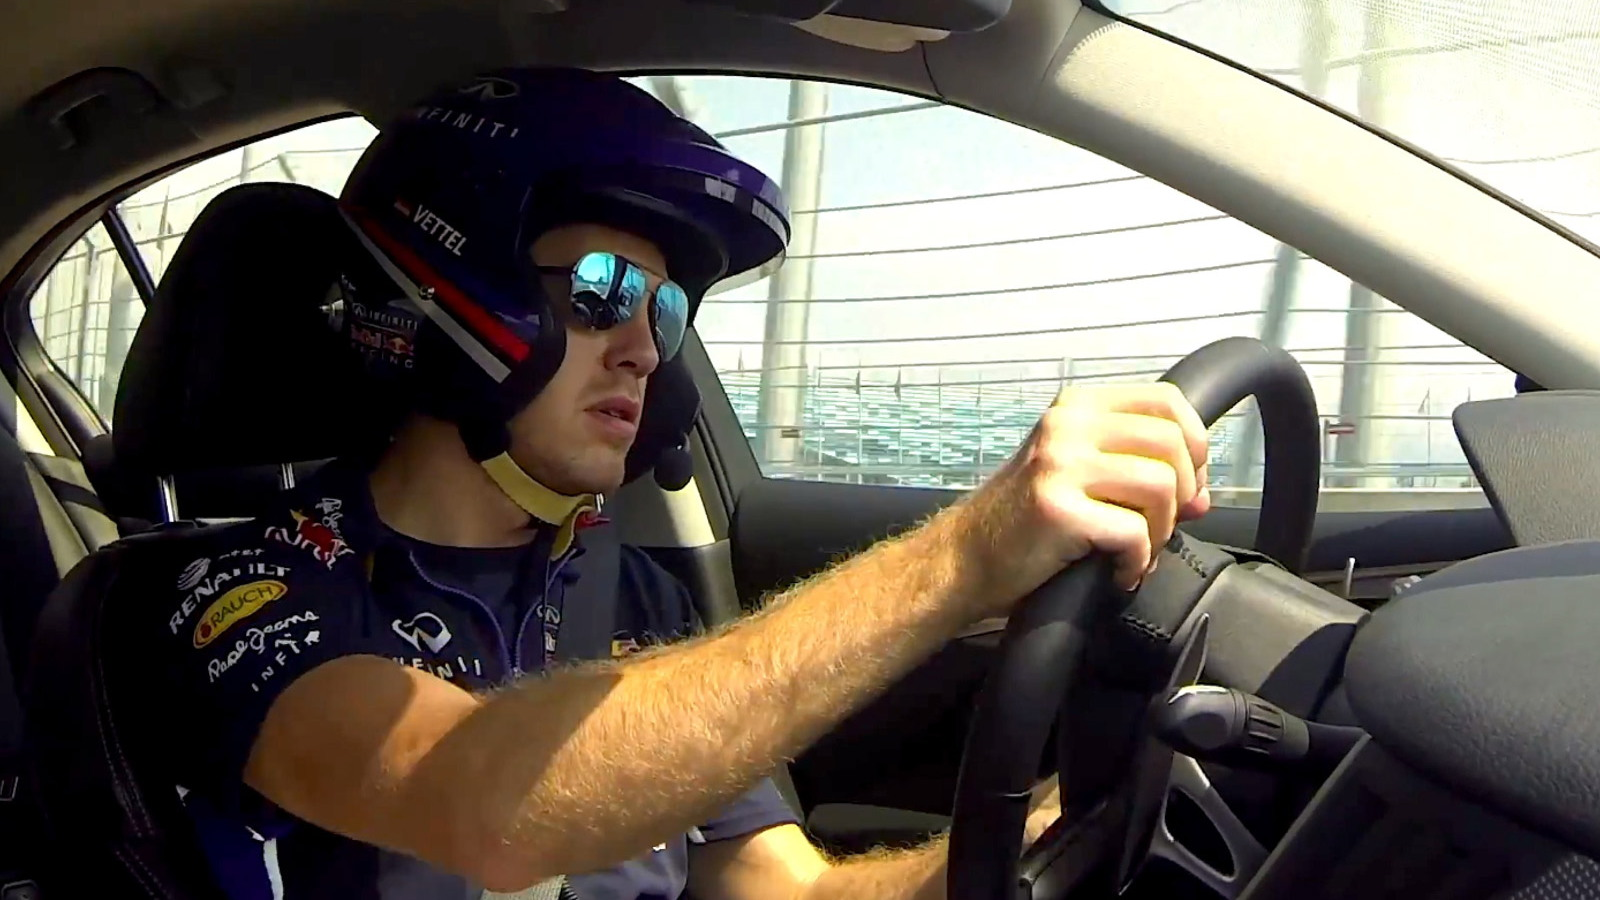 Sebastian Vettel driving Russia's Sochi Circuit in an Infiniti Q50 Hybrid